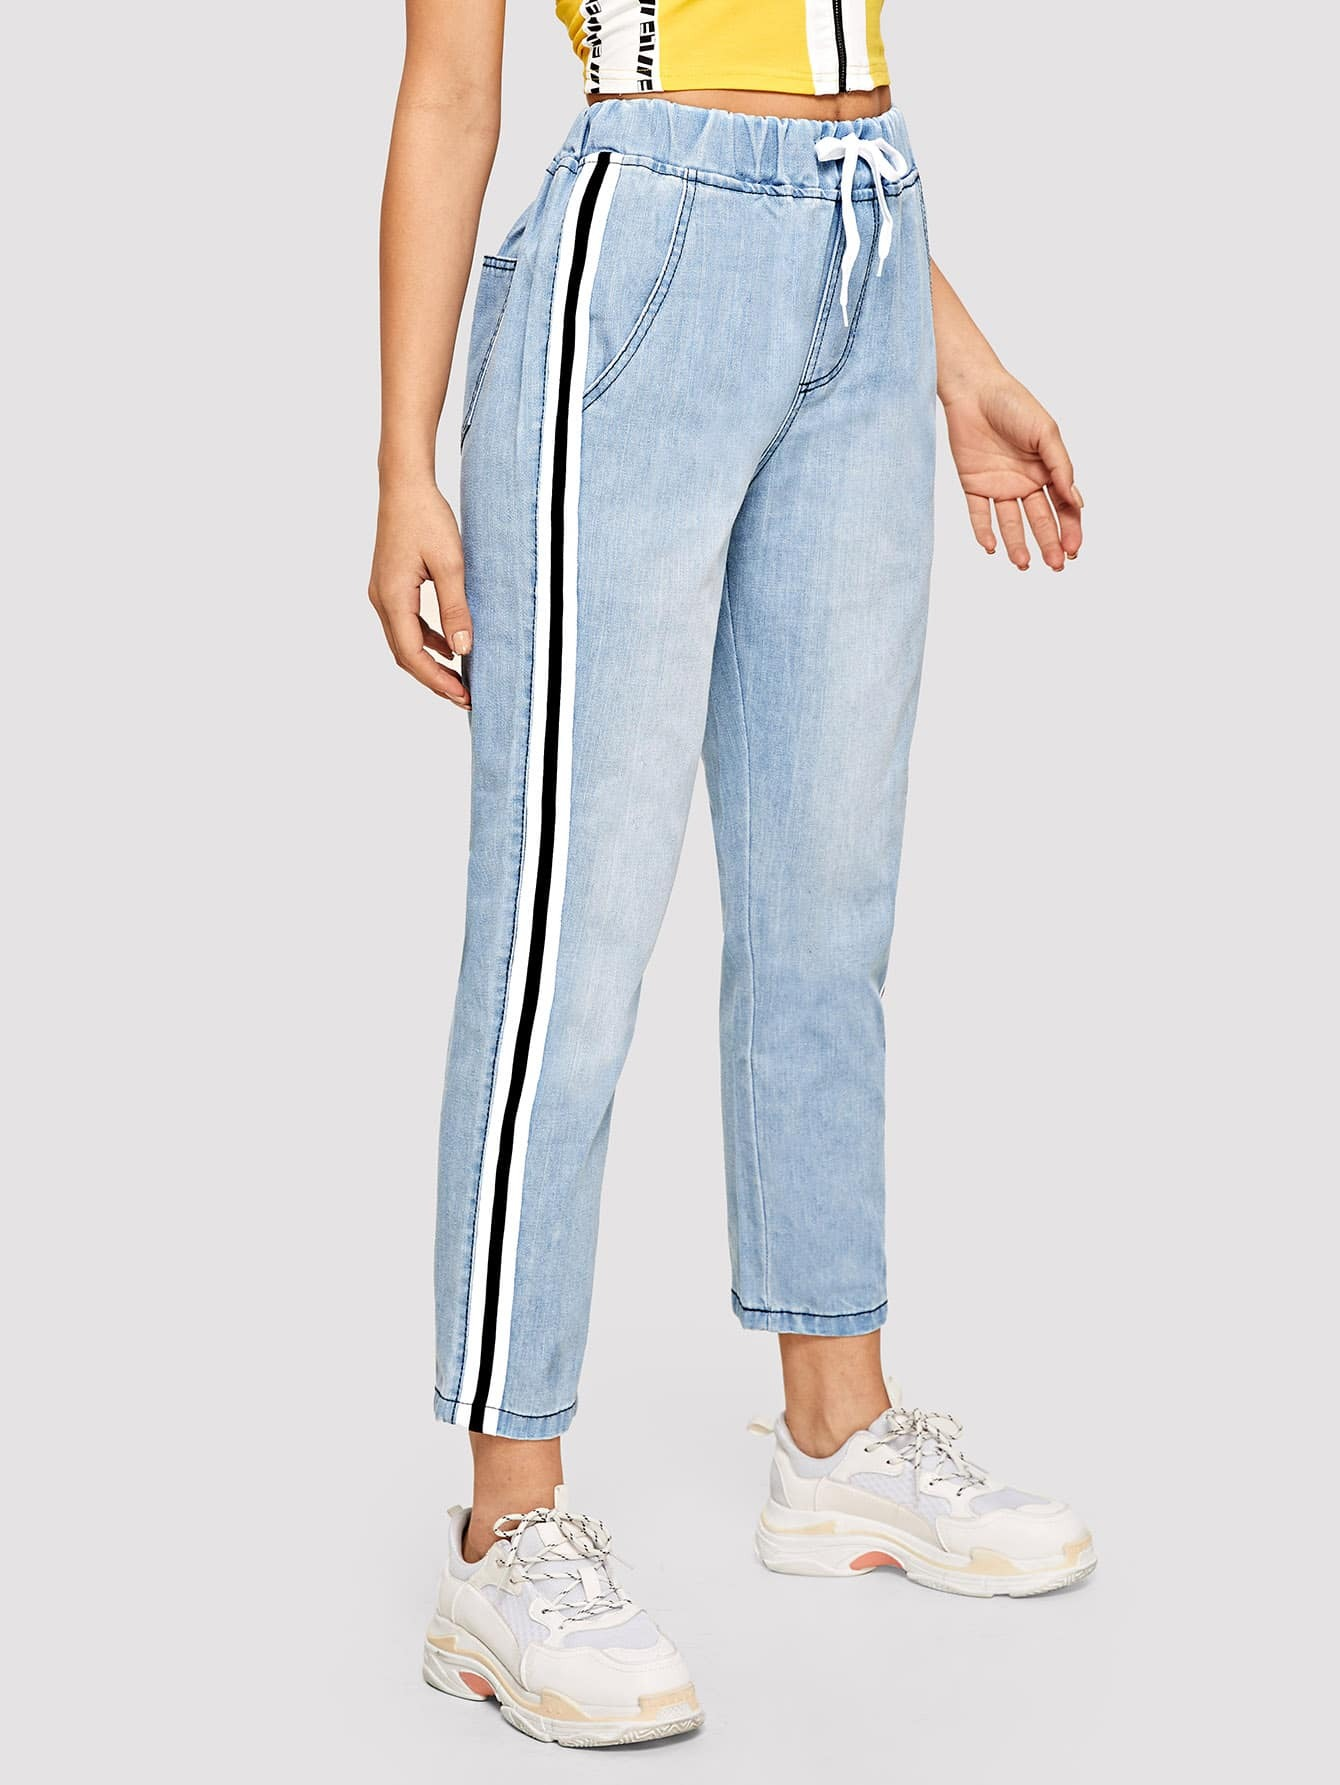 Tape Detail Drawstring Waist Jeans Tape Detail Drawstring Waist Jeans